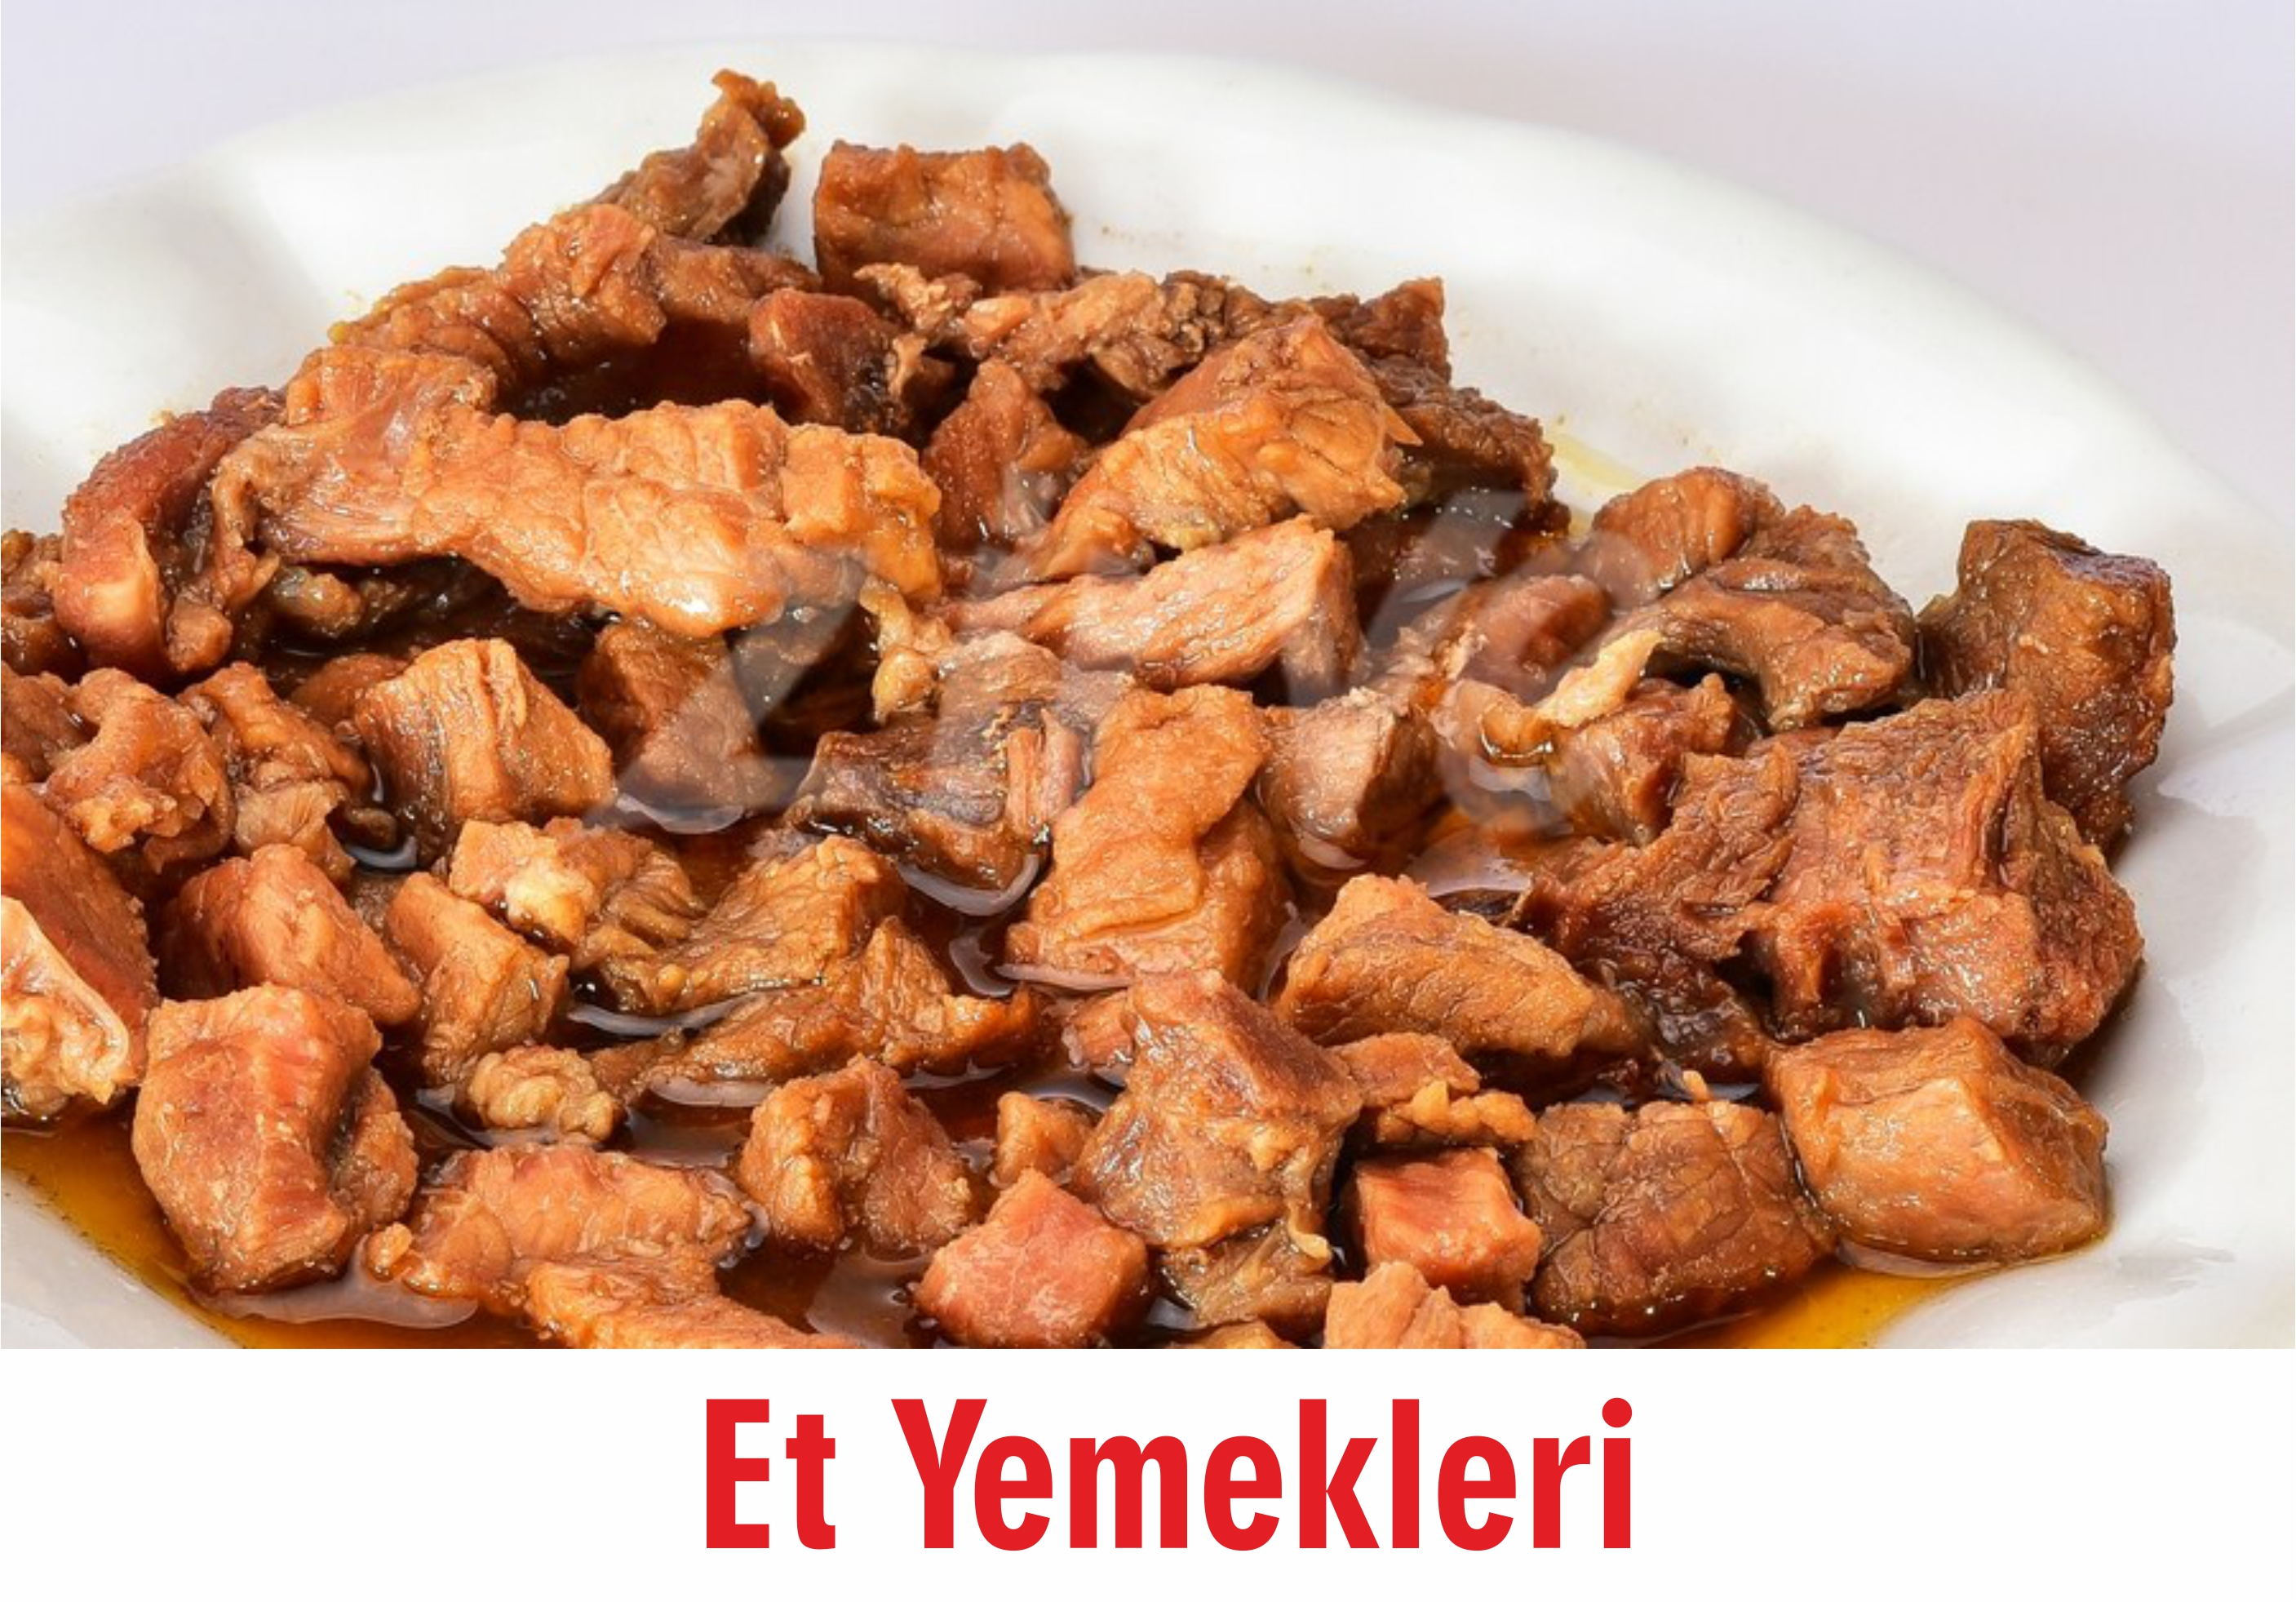 http://www.zirvetinaztepe.com/menu-2/ana-yemekler-3/et-yemekleri/